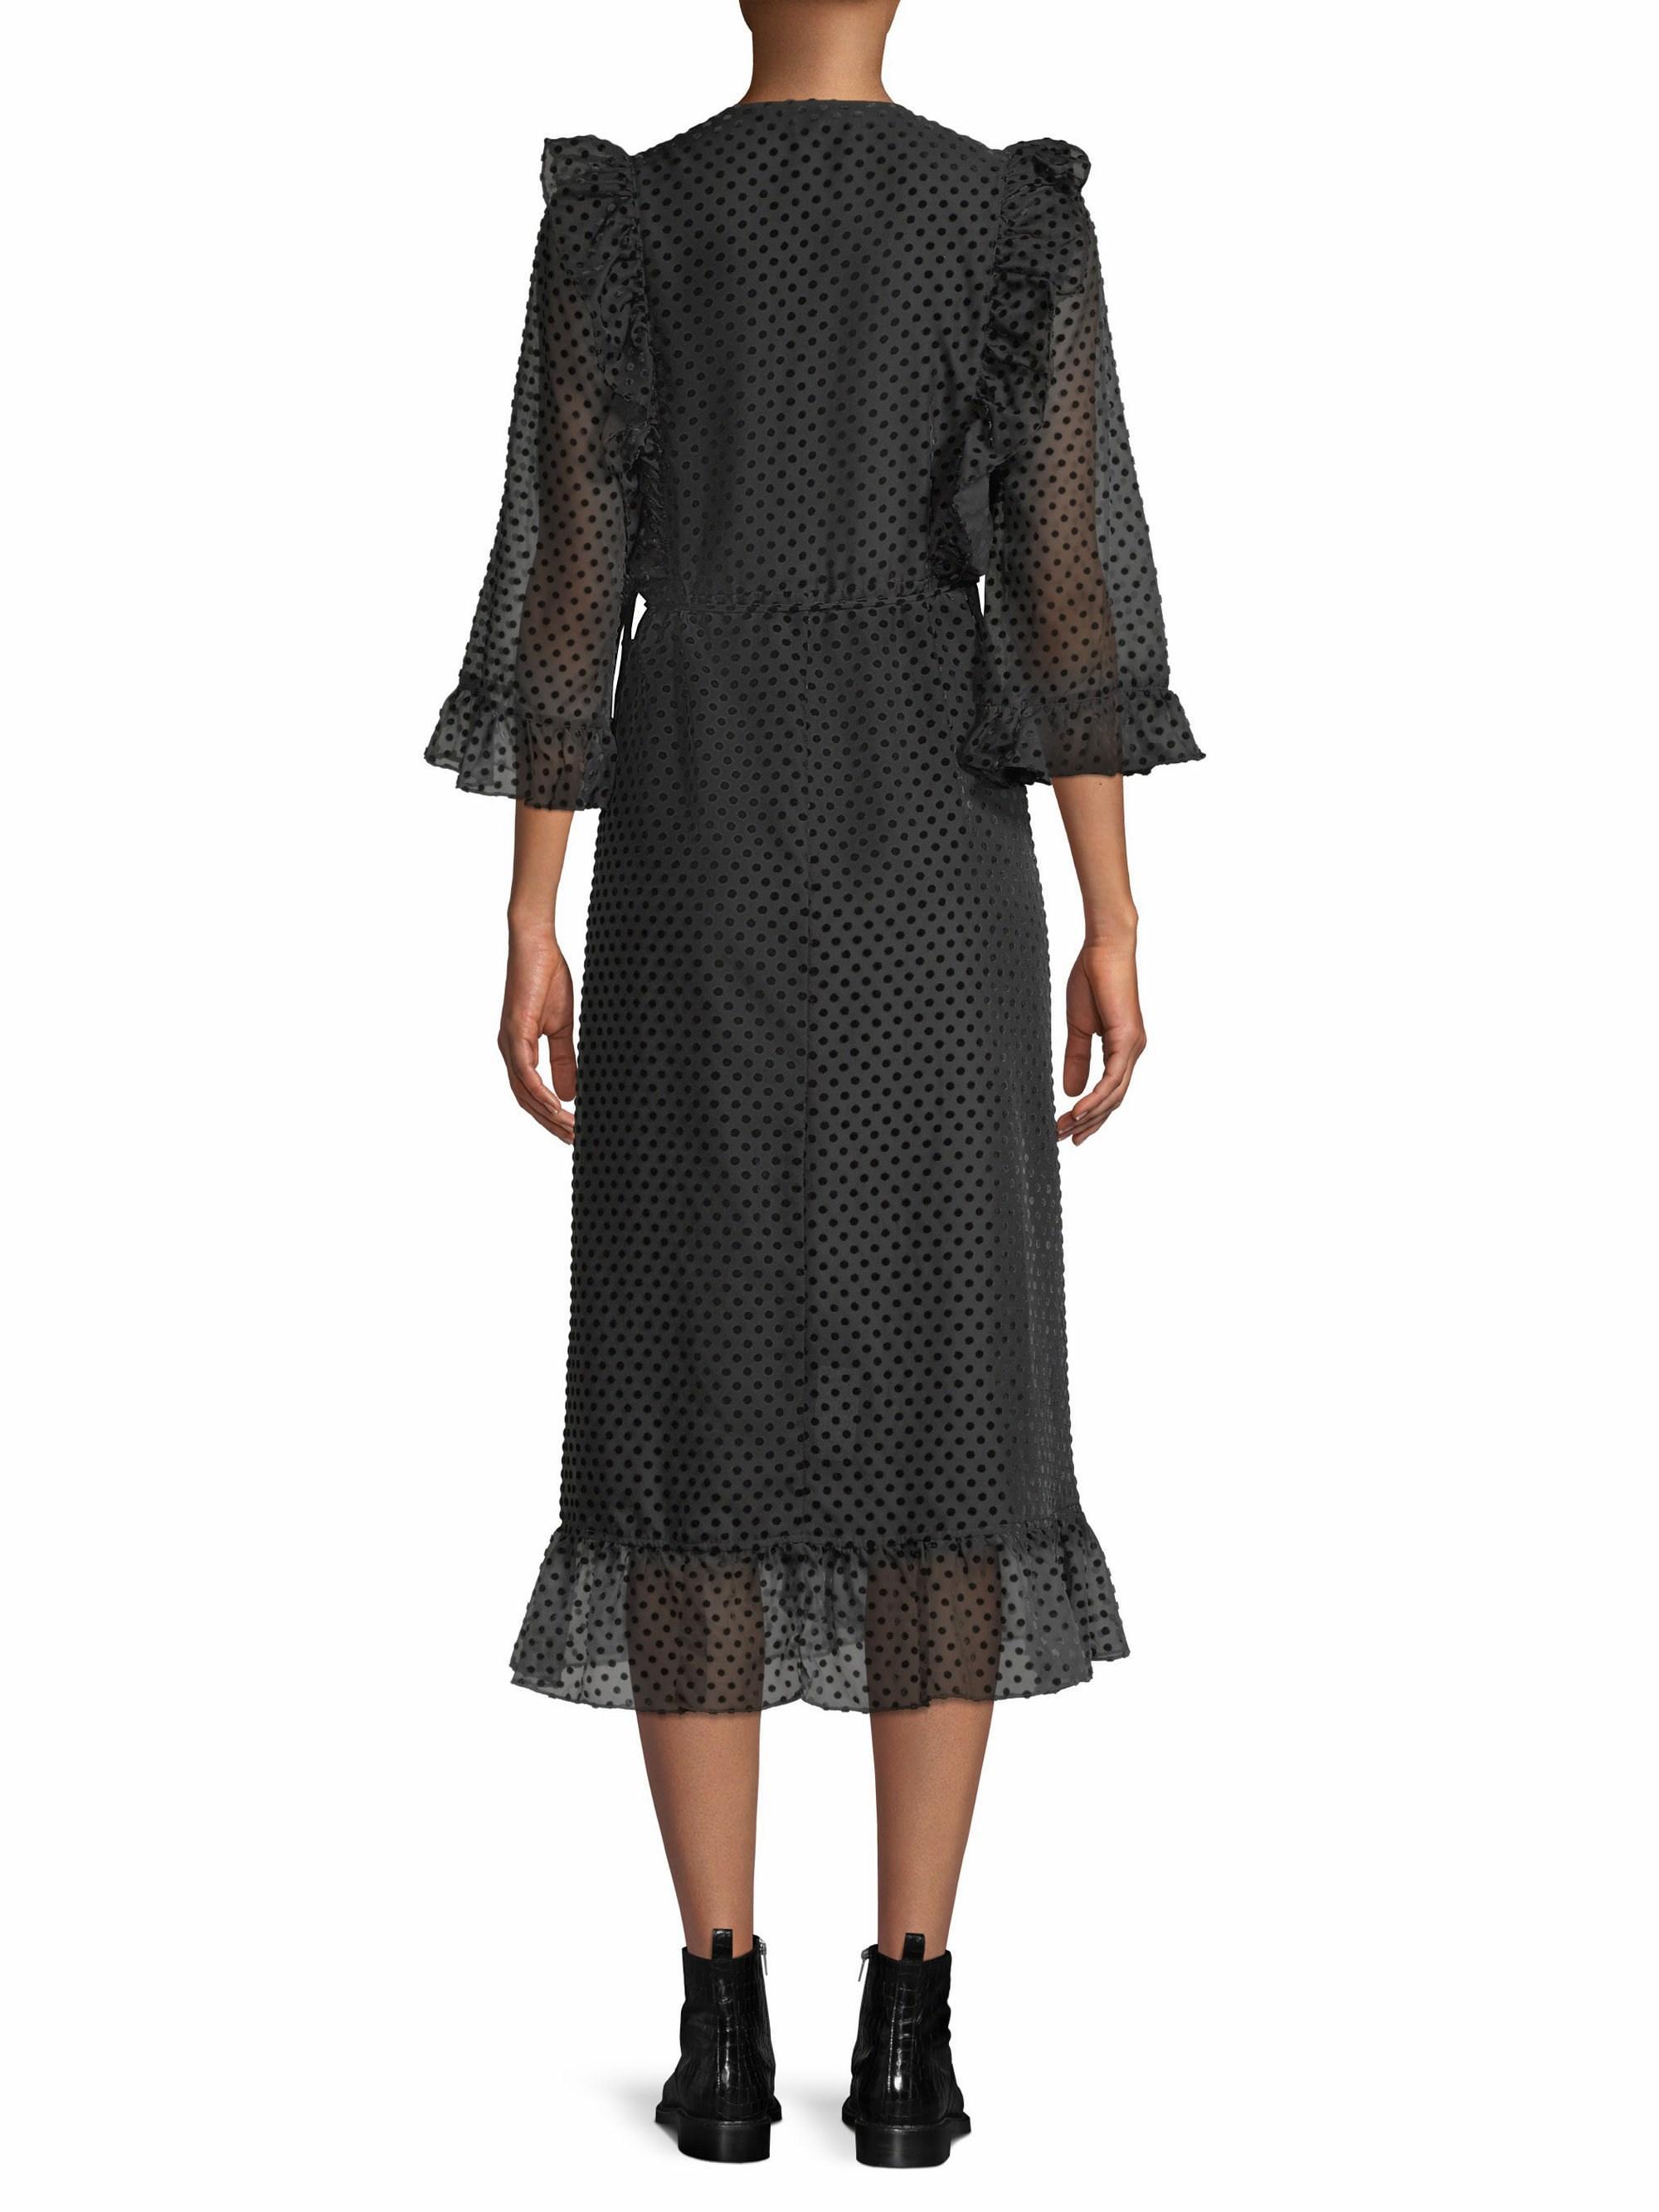 88b2fea0f872 Ganni Jasmine Polka Dot Wrap Dress in Black - Lyst